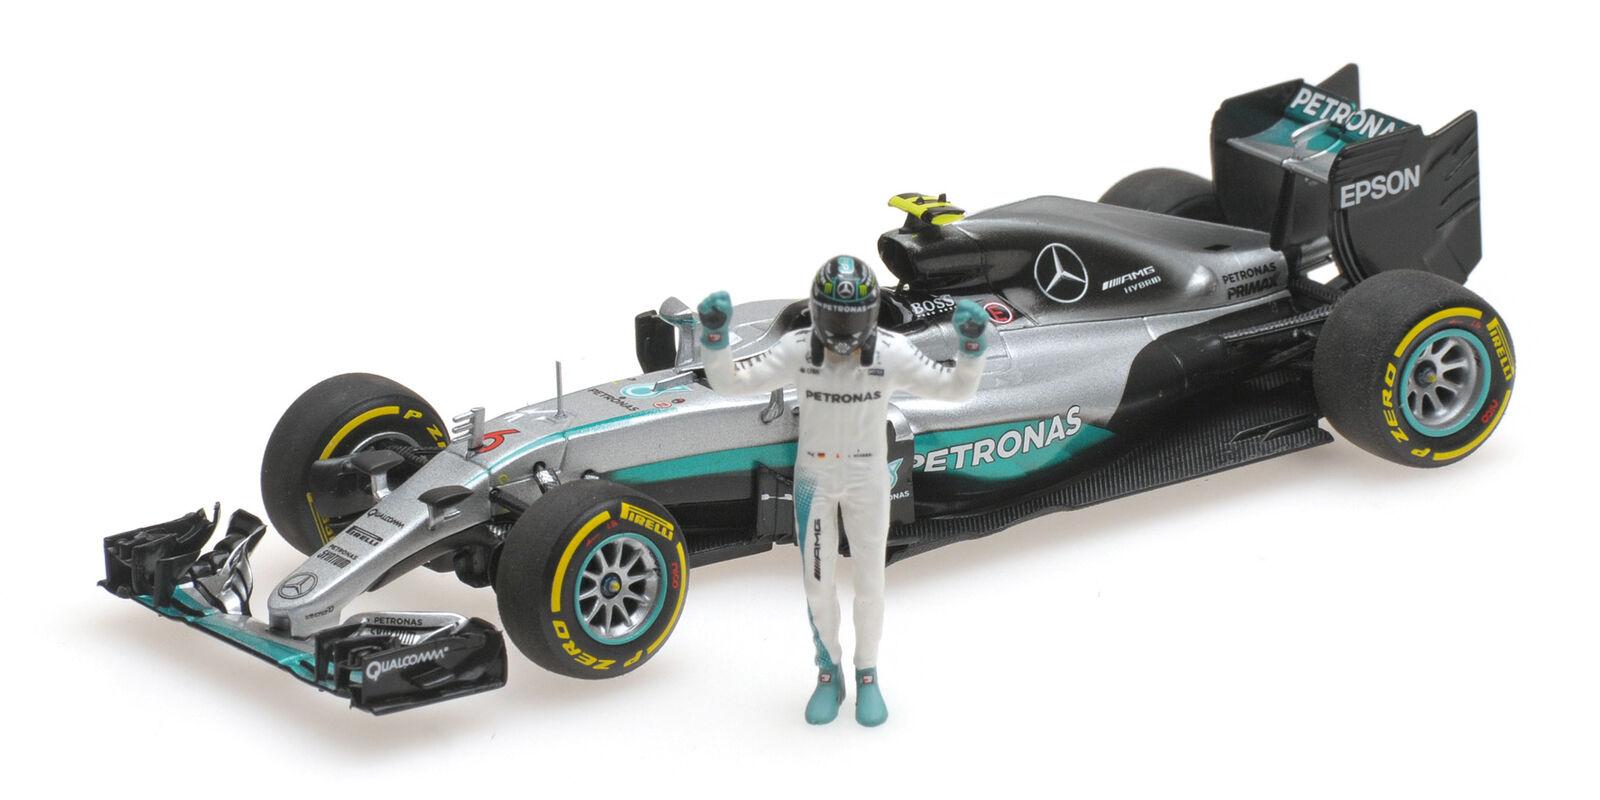 410160806 - - - Minichamps Mercedes f1-w07 Hybride  6 N. Rosberg - 2016 - 1 43 e739a9